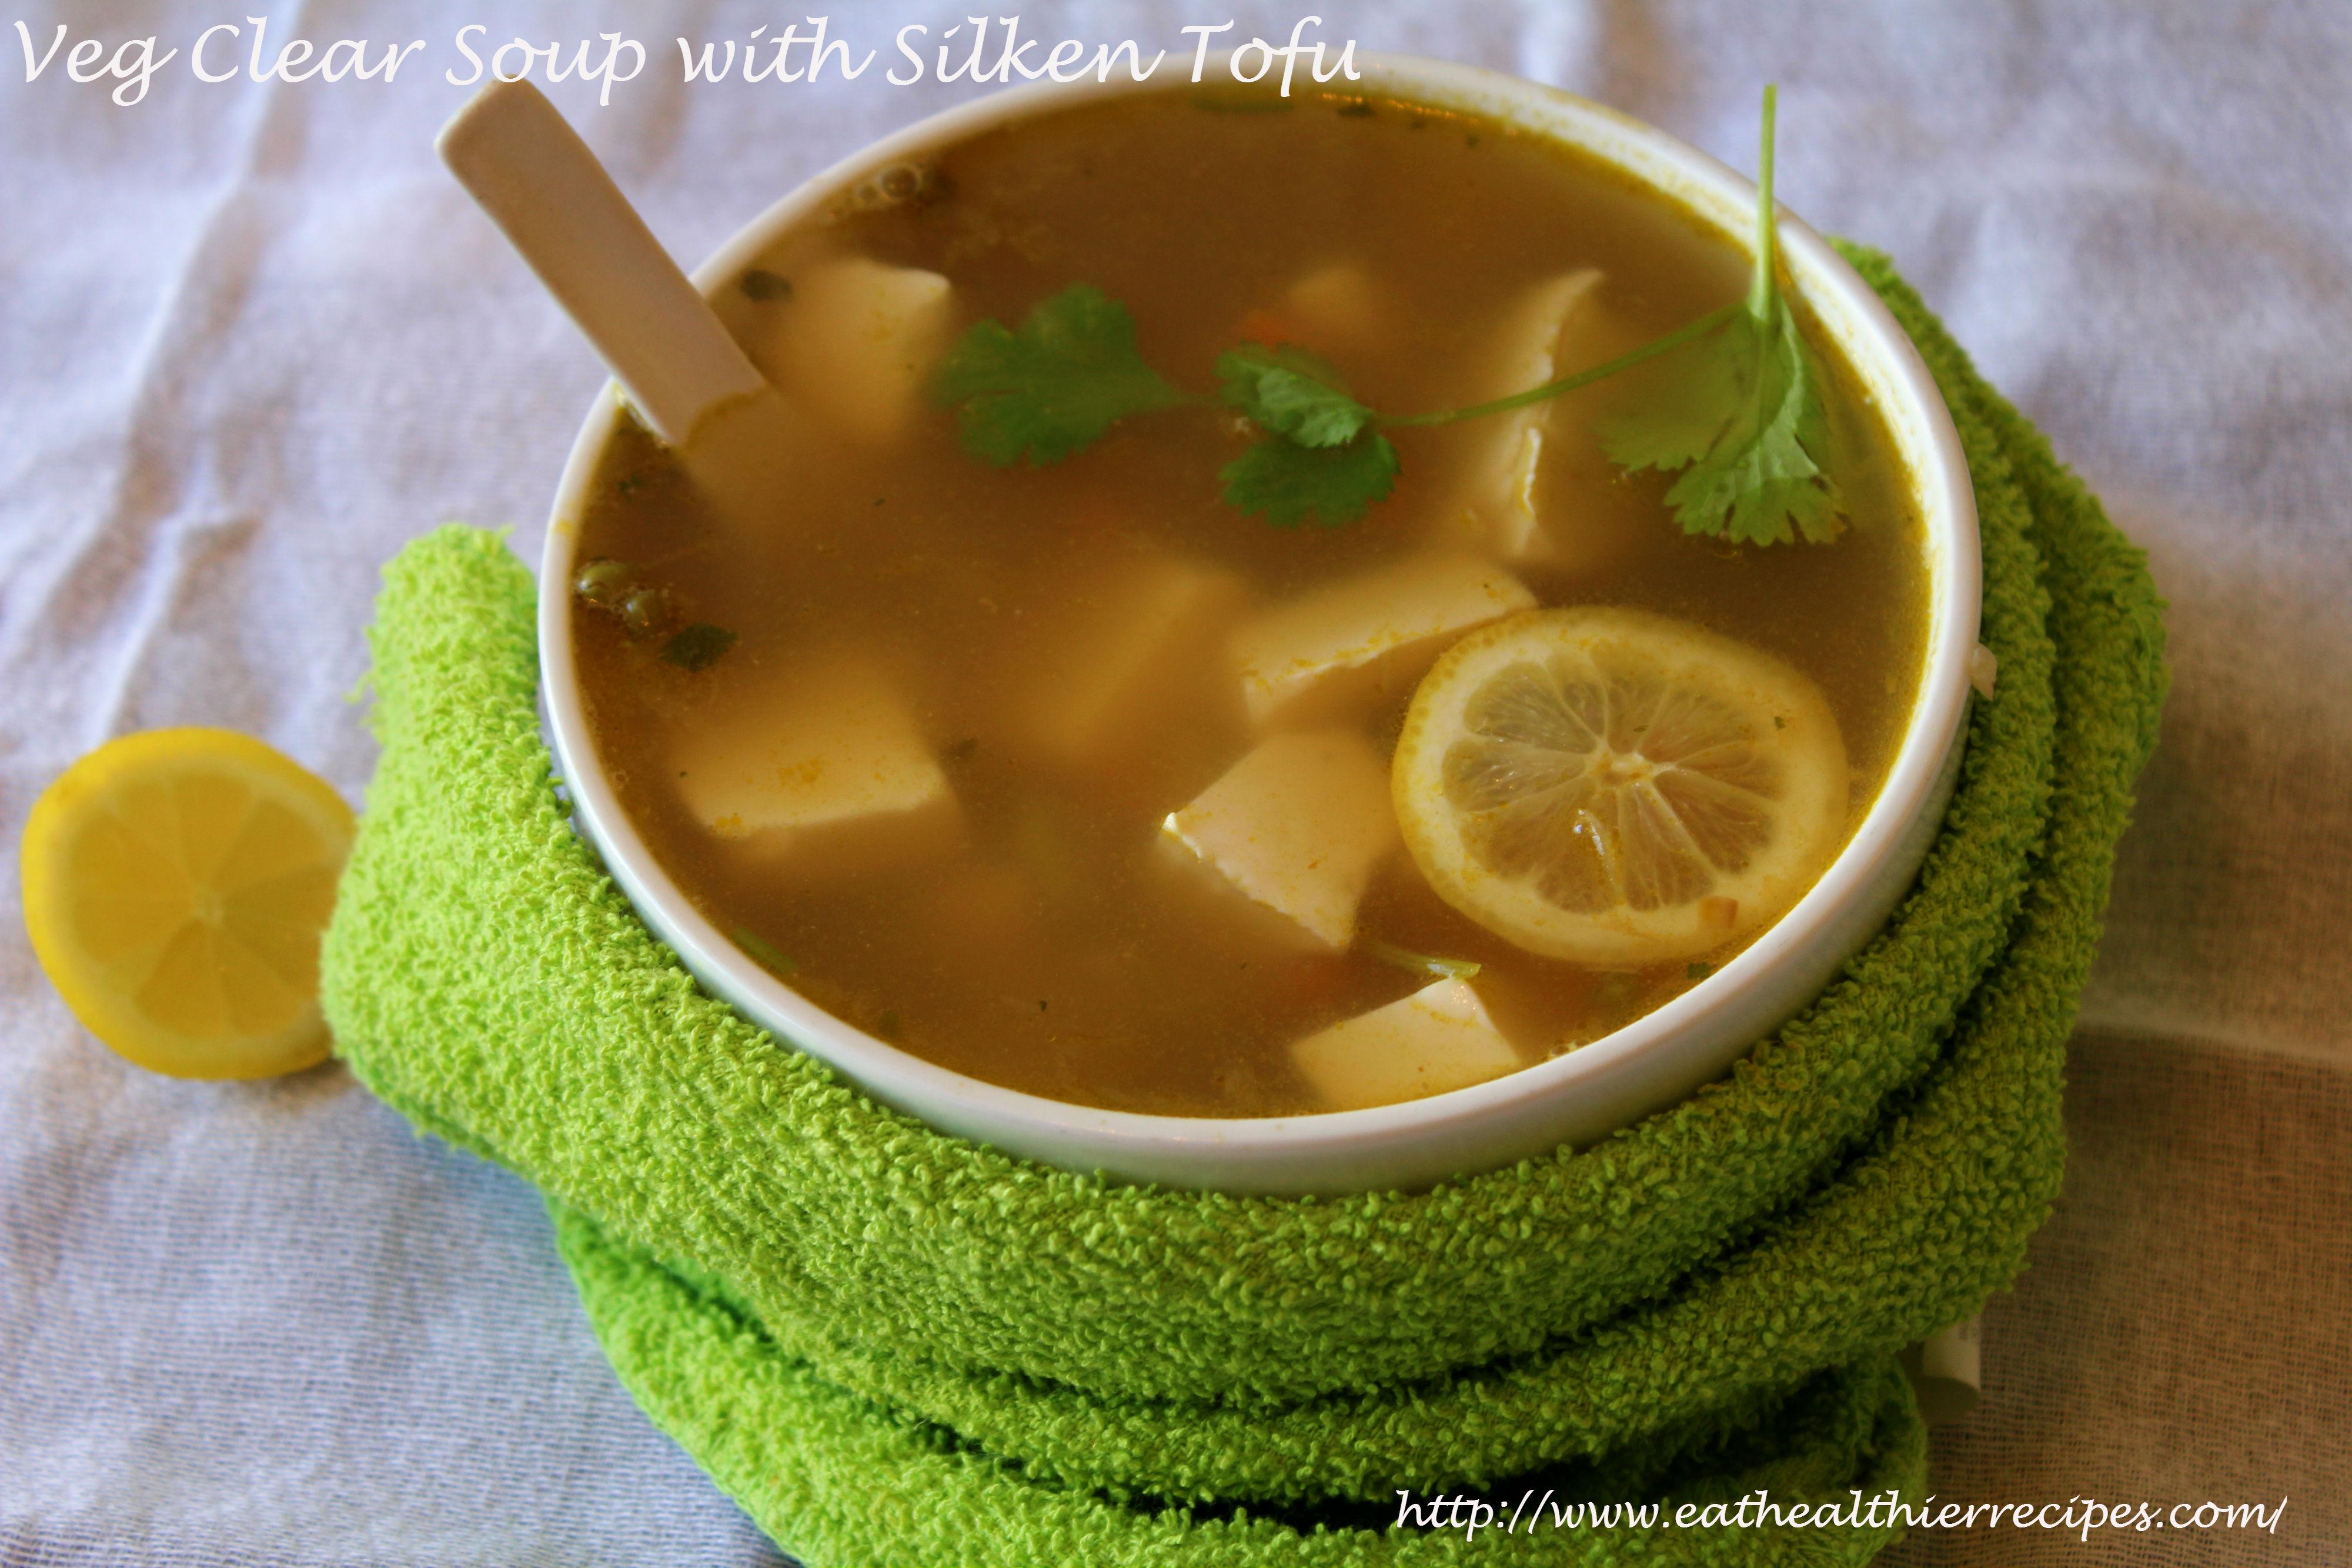 Veg Clear Soup with Silken Tofu